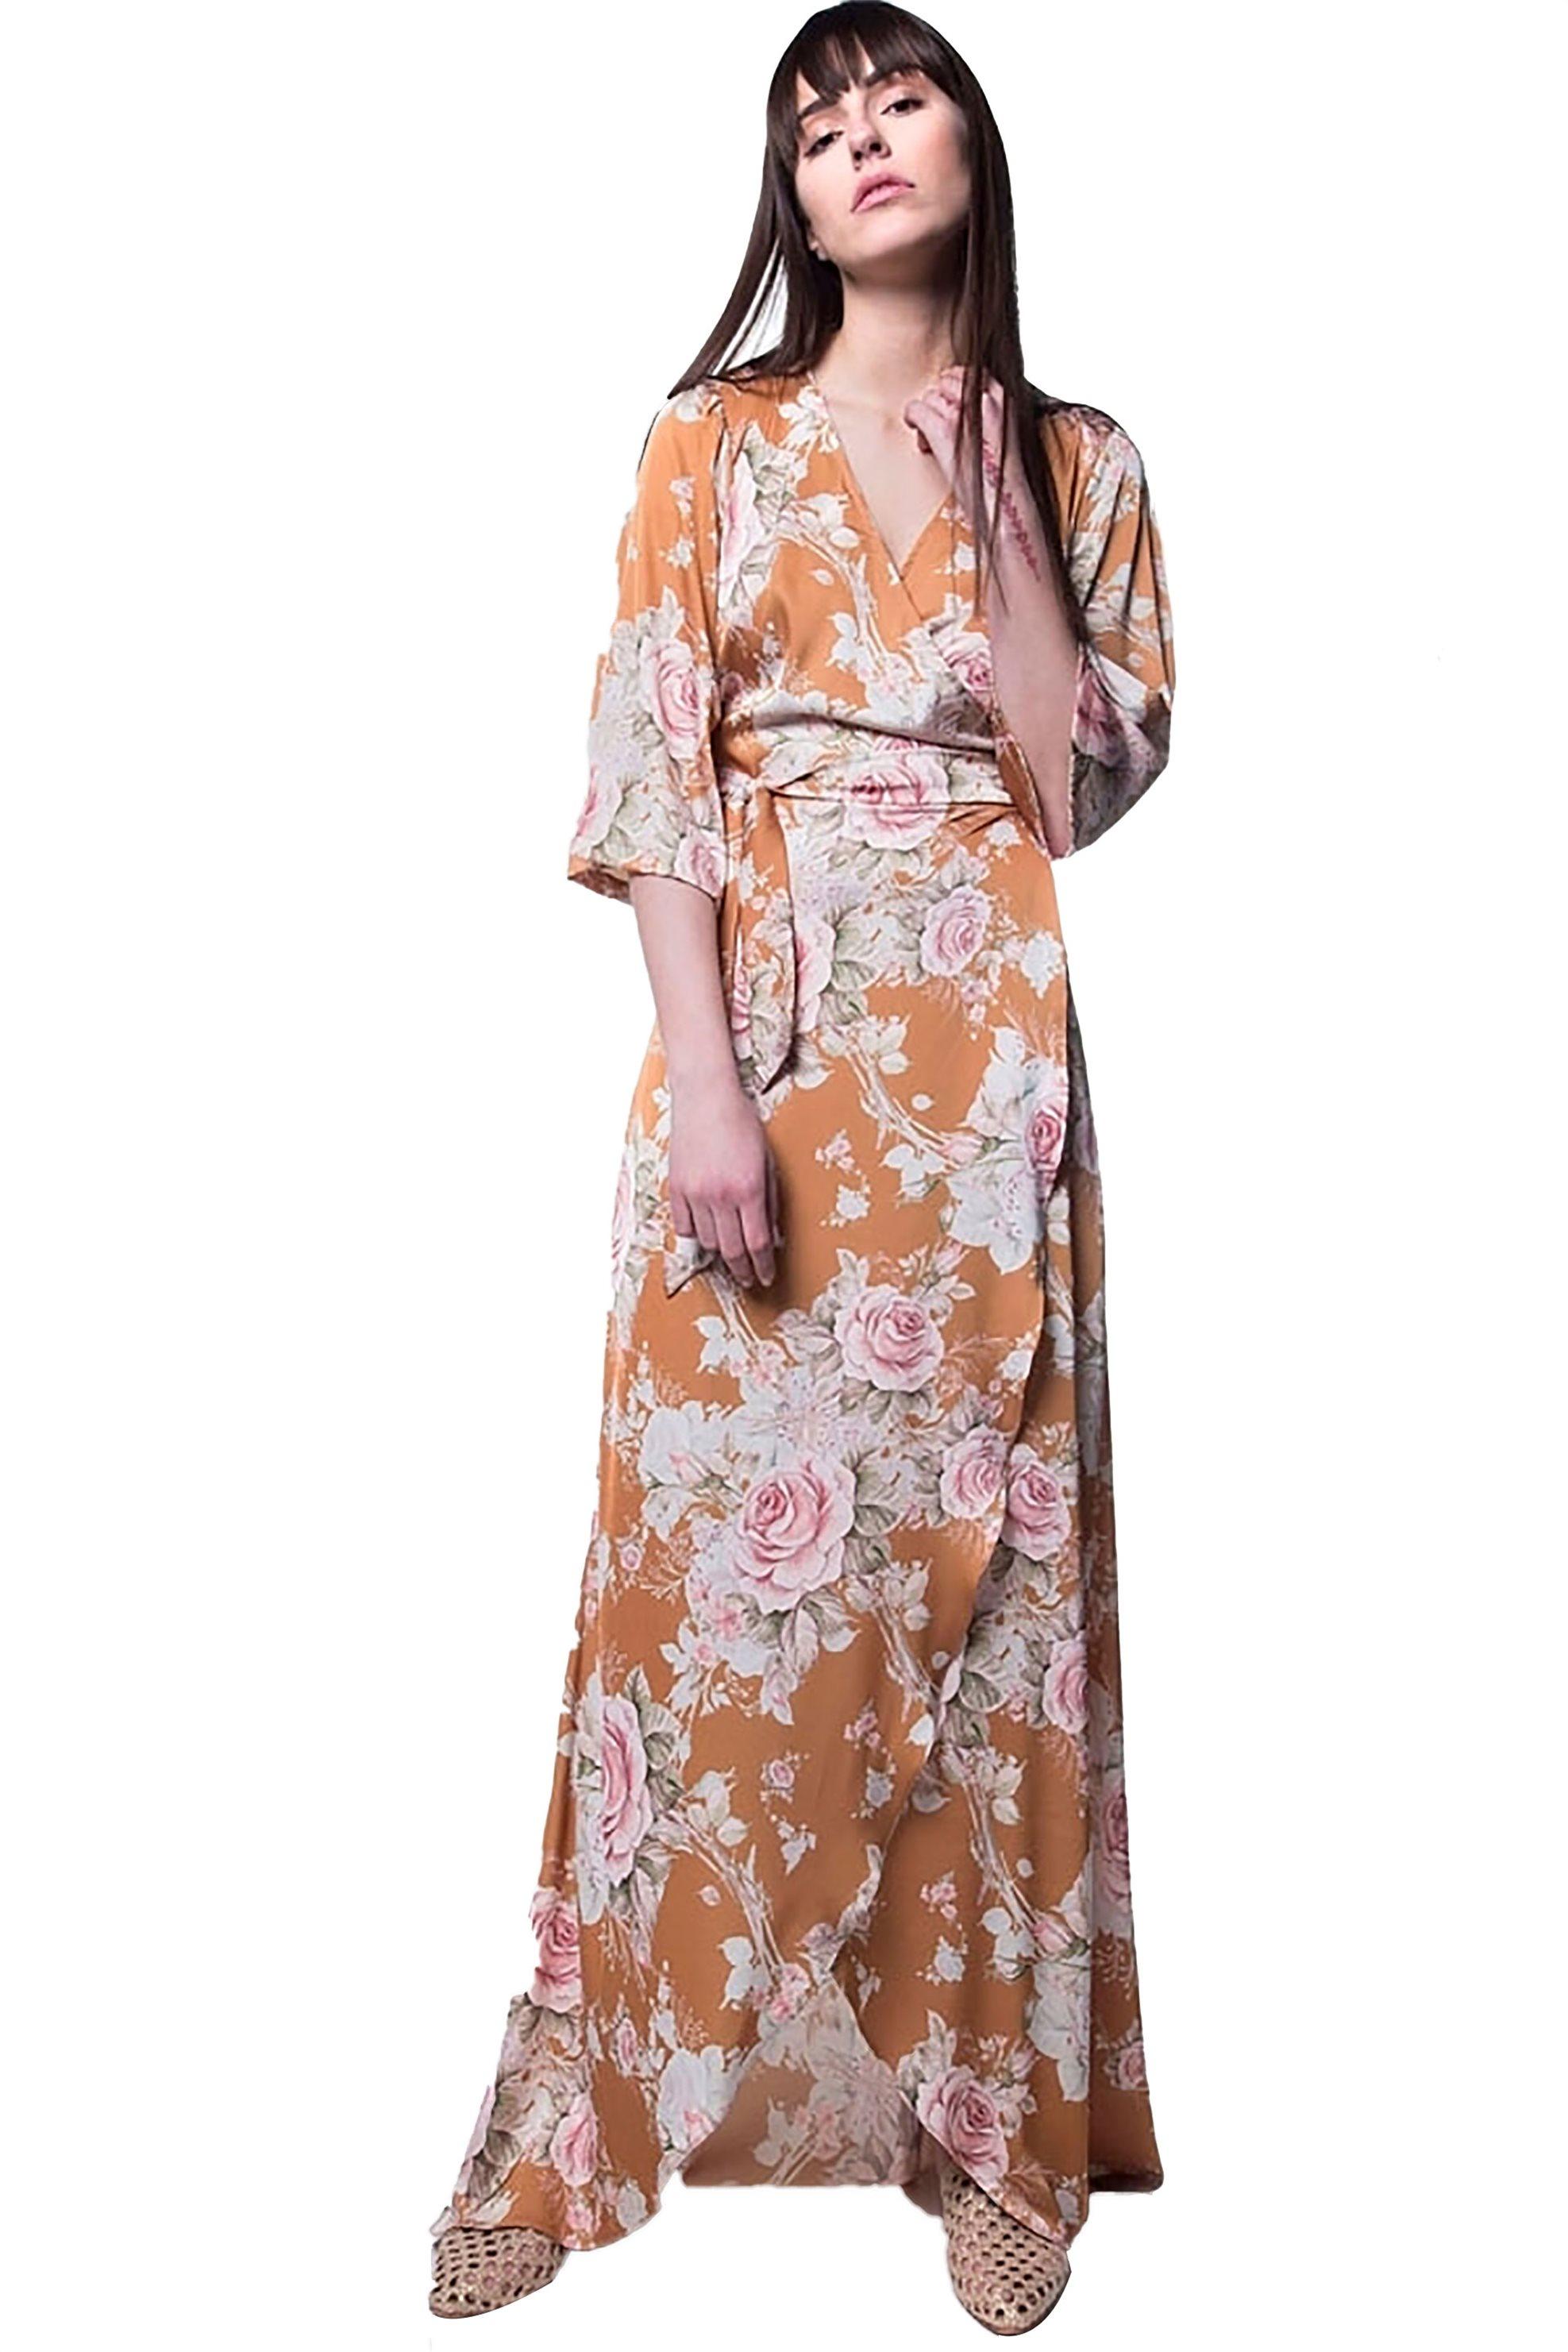 e29bef1f20bb Γυναικεία   Ρούχα   Φορέματα   Μακριά   Floral maxi φόρεμα από ...